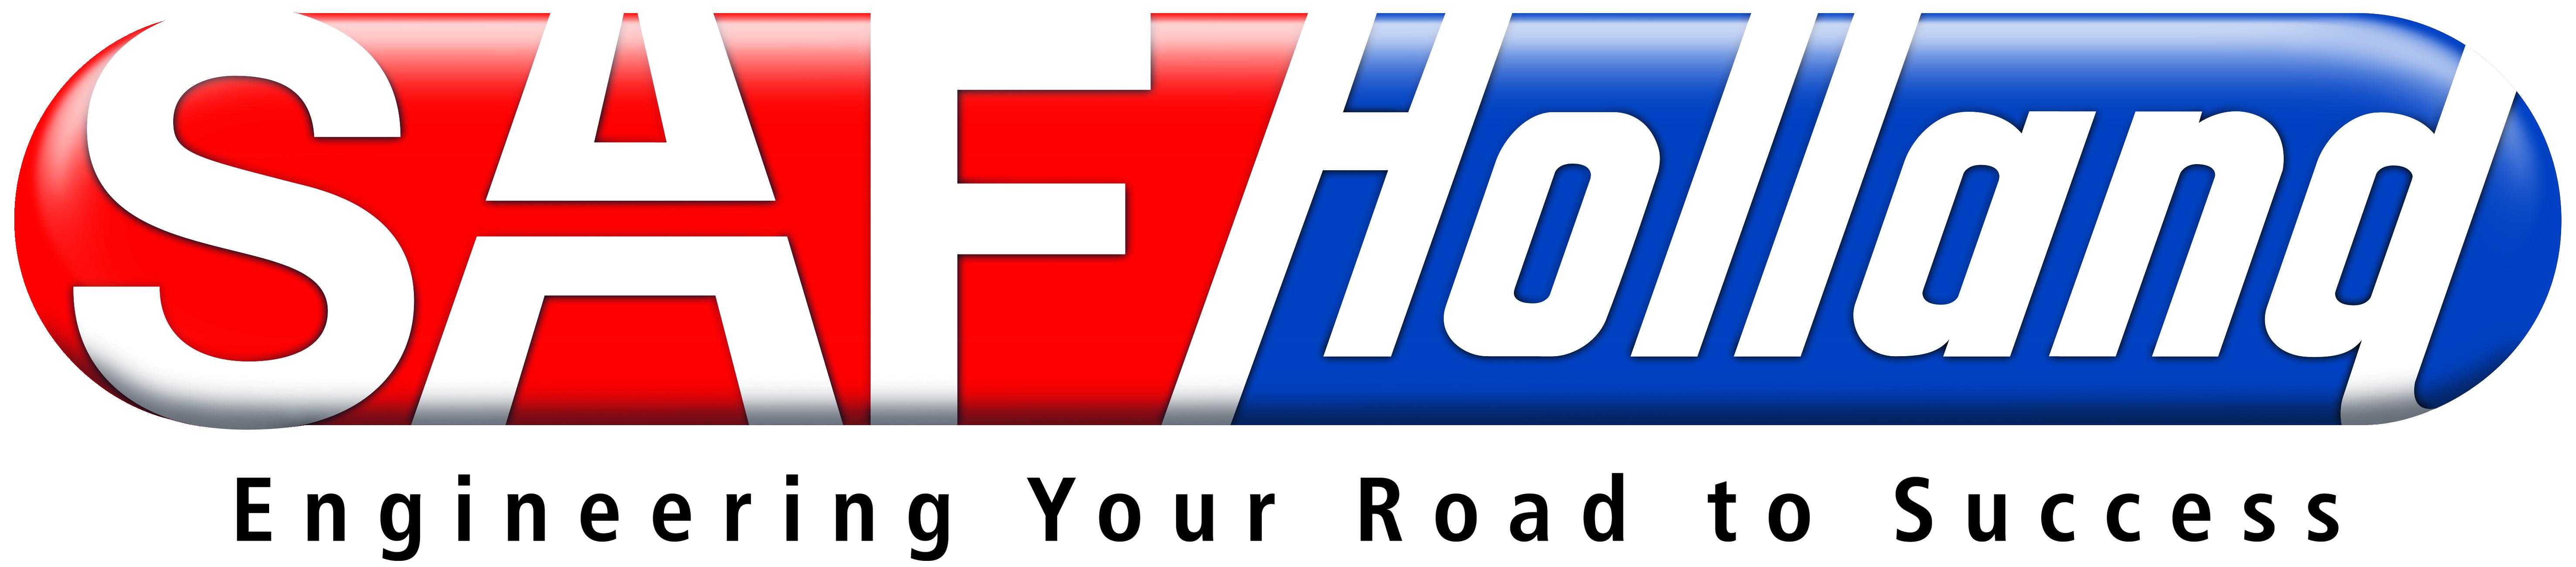 SAF-HOLLAND Logo 3D Claim CMYK